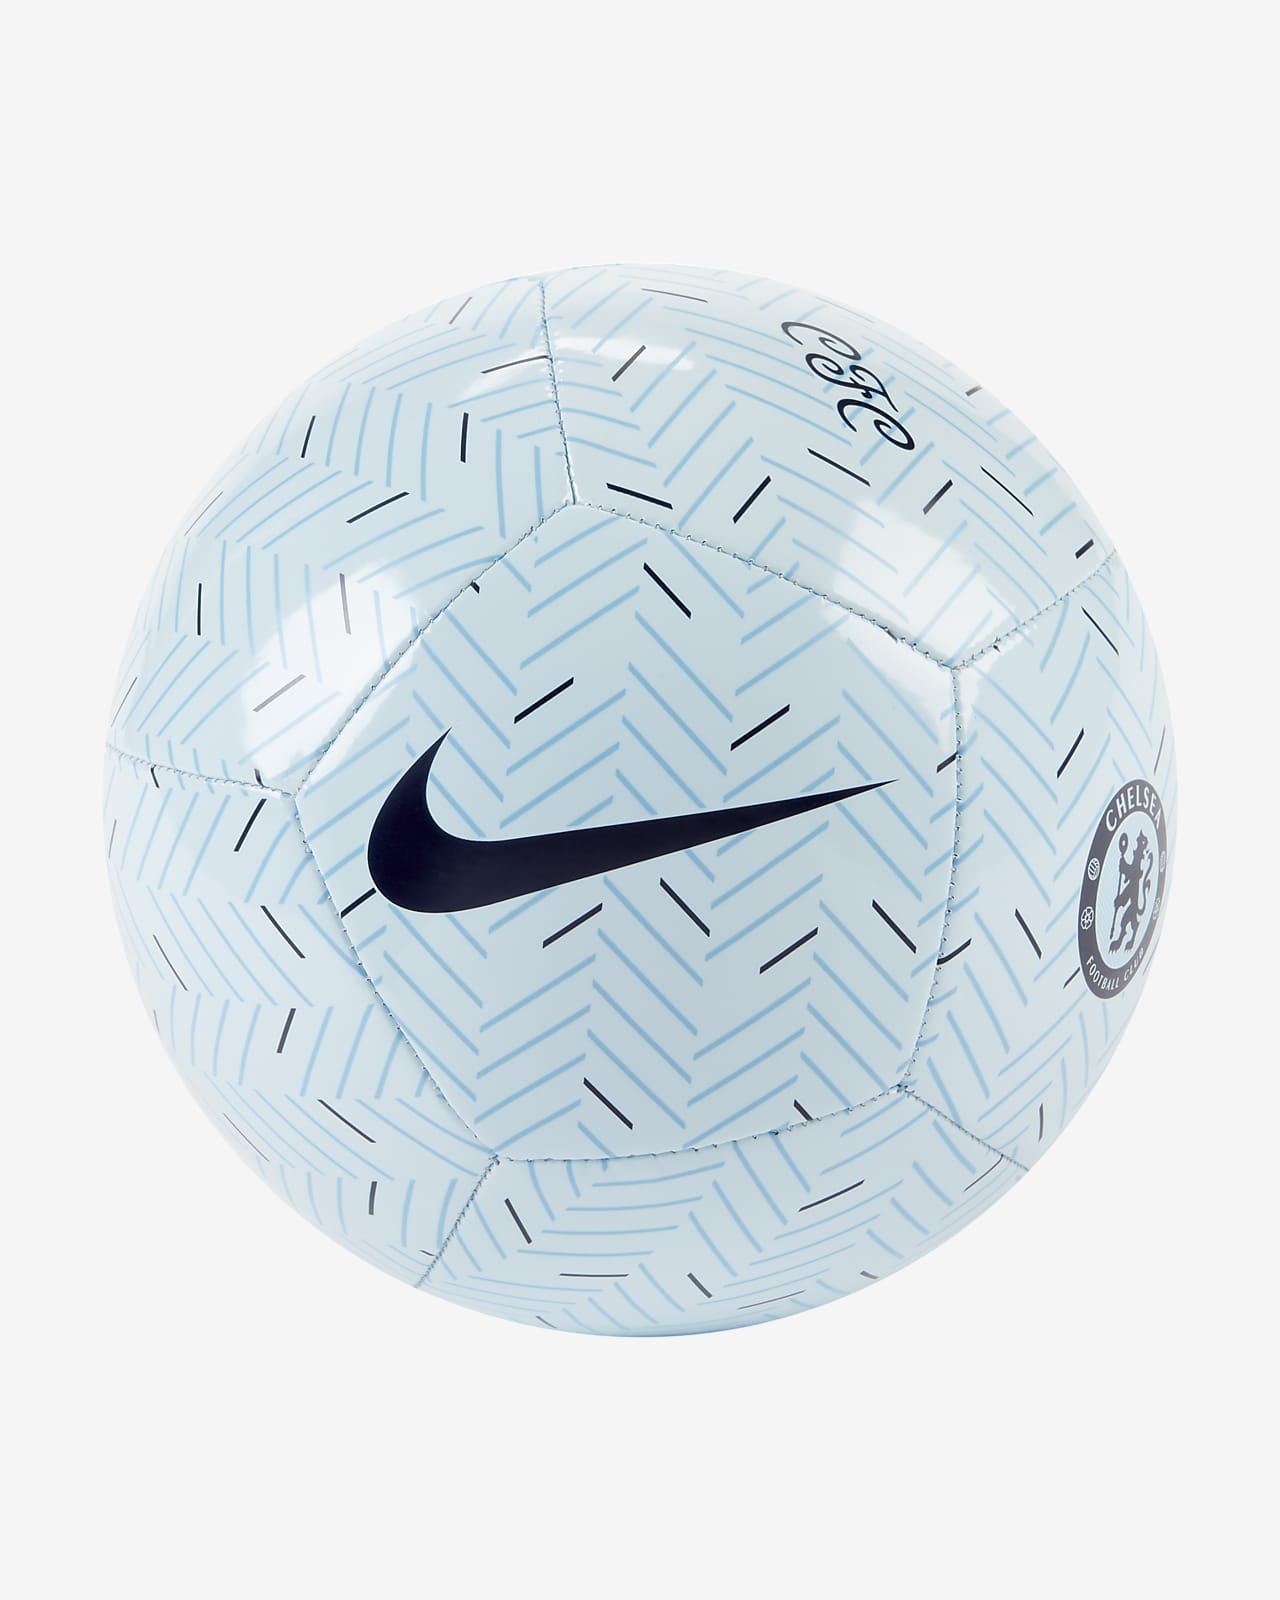 Chelsea F.C. Pitch Football